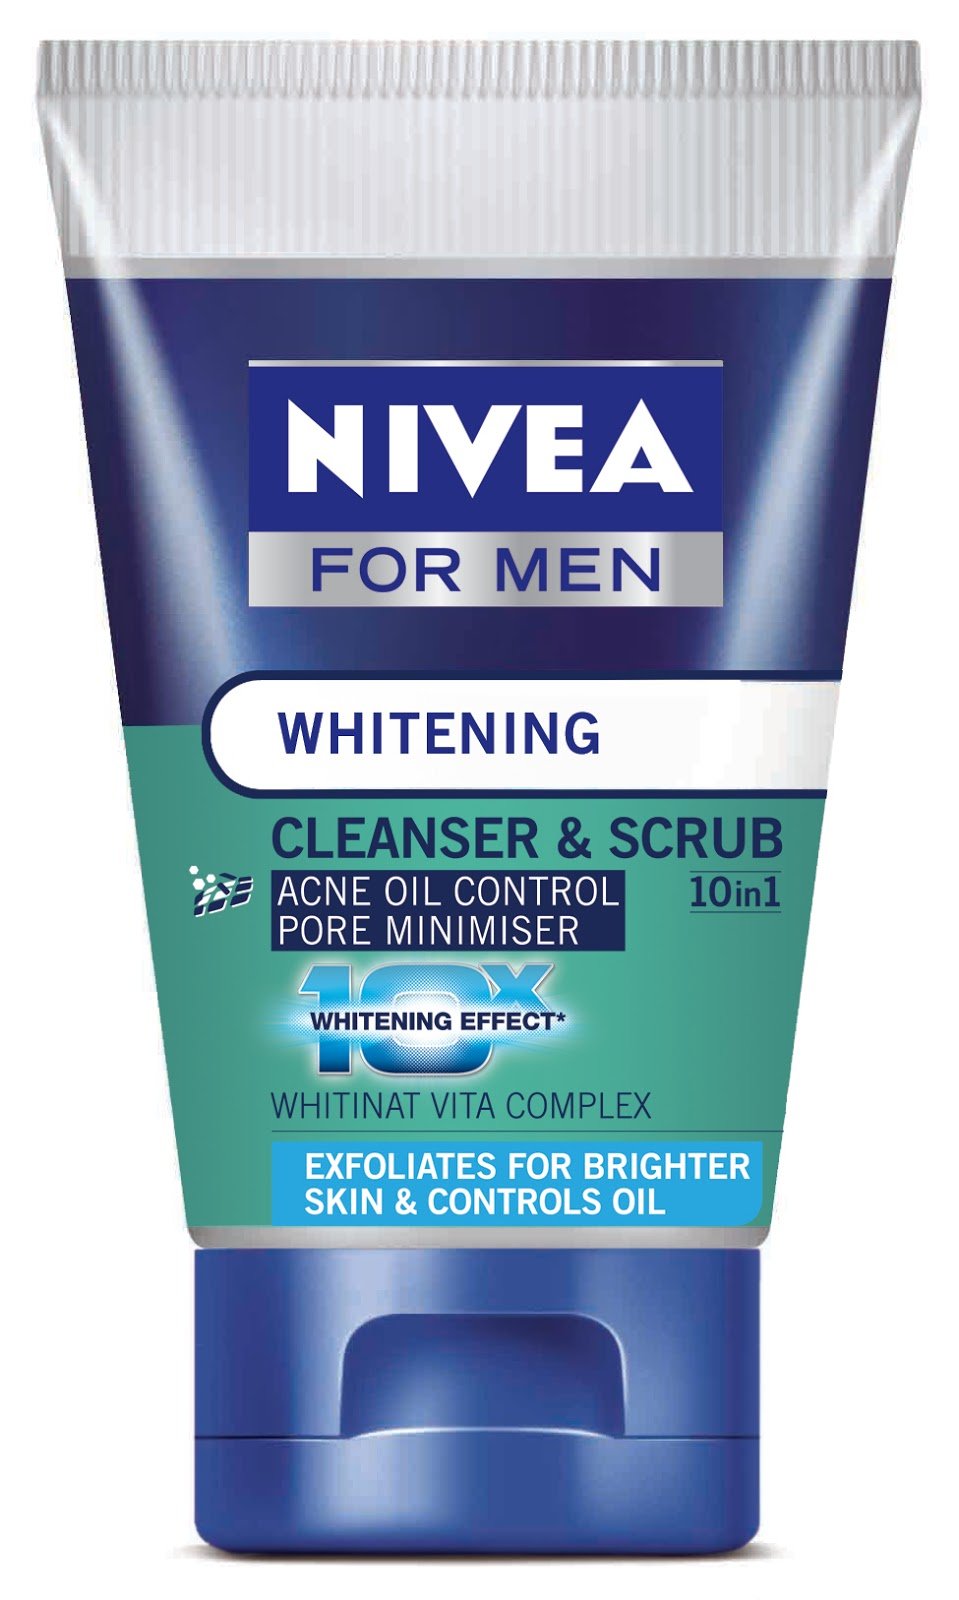 Wonder Woman Rises: Nivea for Men: Like a Pogi (GIVEAWAY ... Nivea Face Wash For Men Oil Control